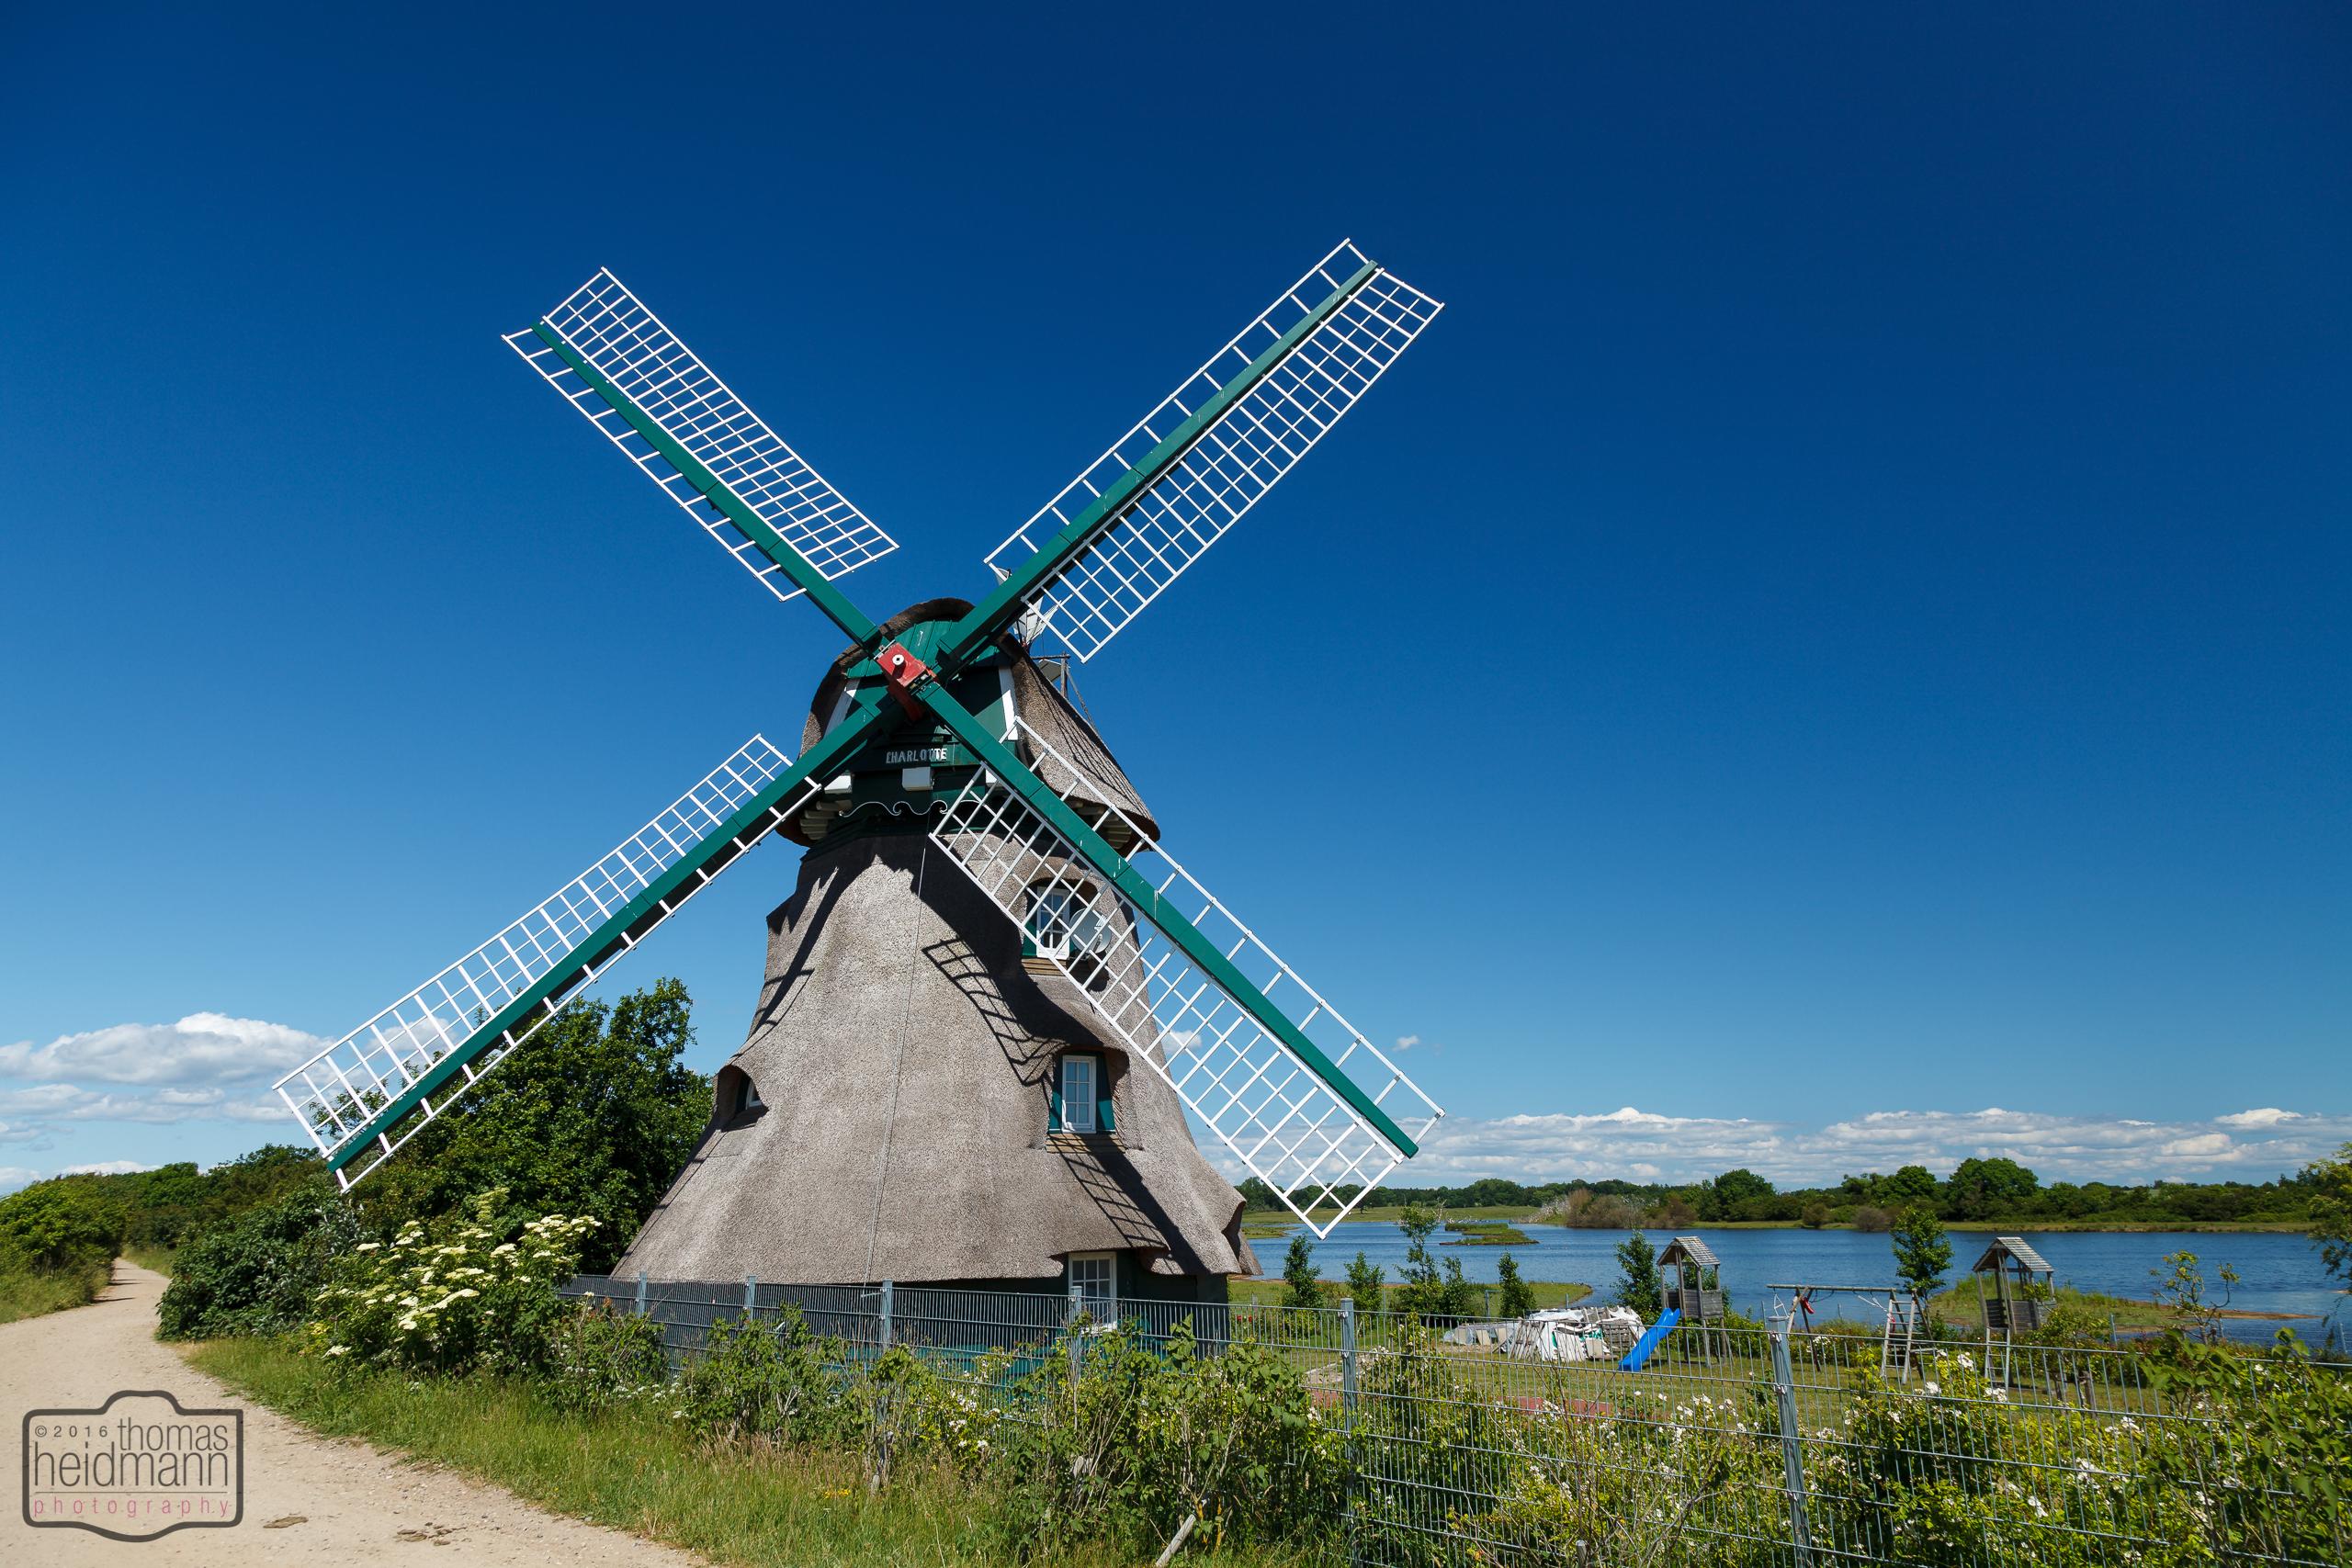 Windmühle Charlotte an der Flensburger Förde